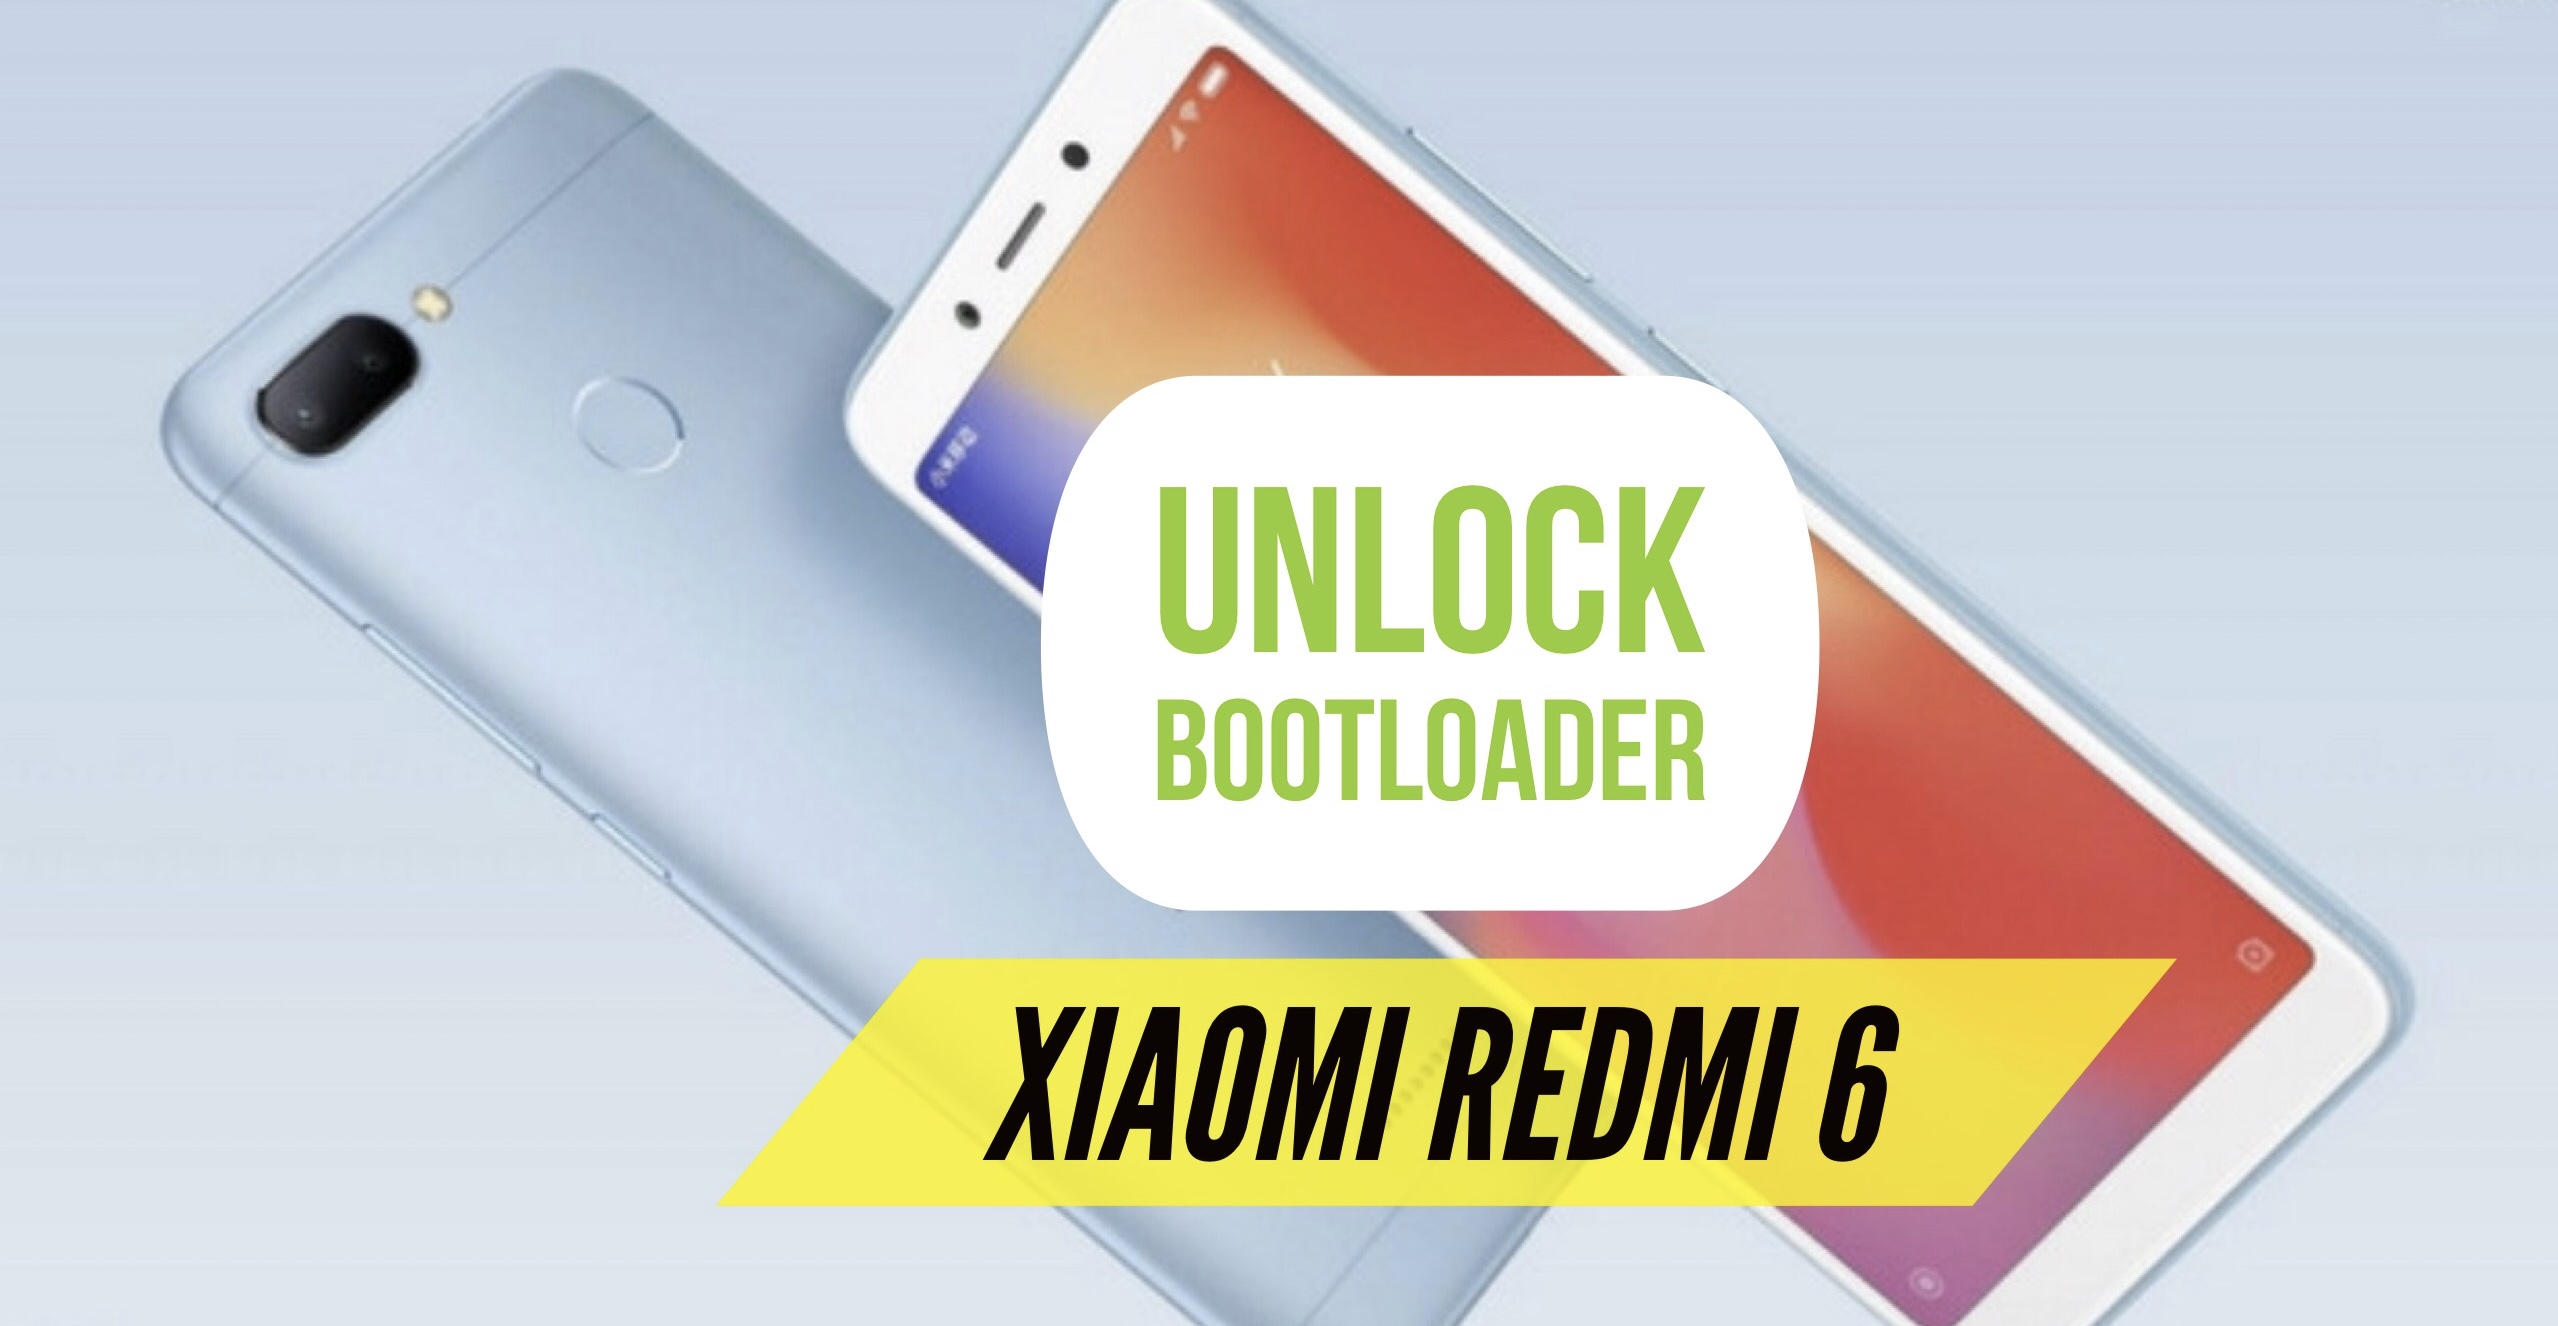 How to Unlock Bootloader on Xiaomi Redmi 6? MI Unlock TOOL!